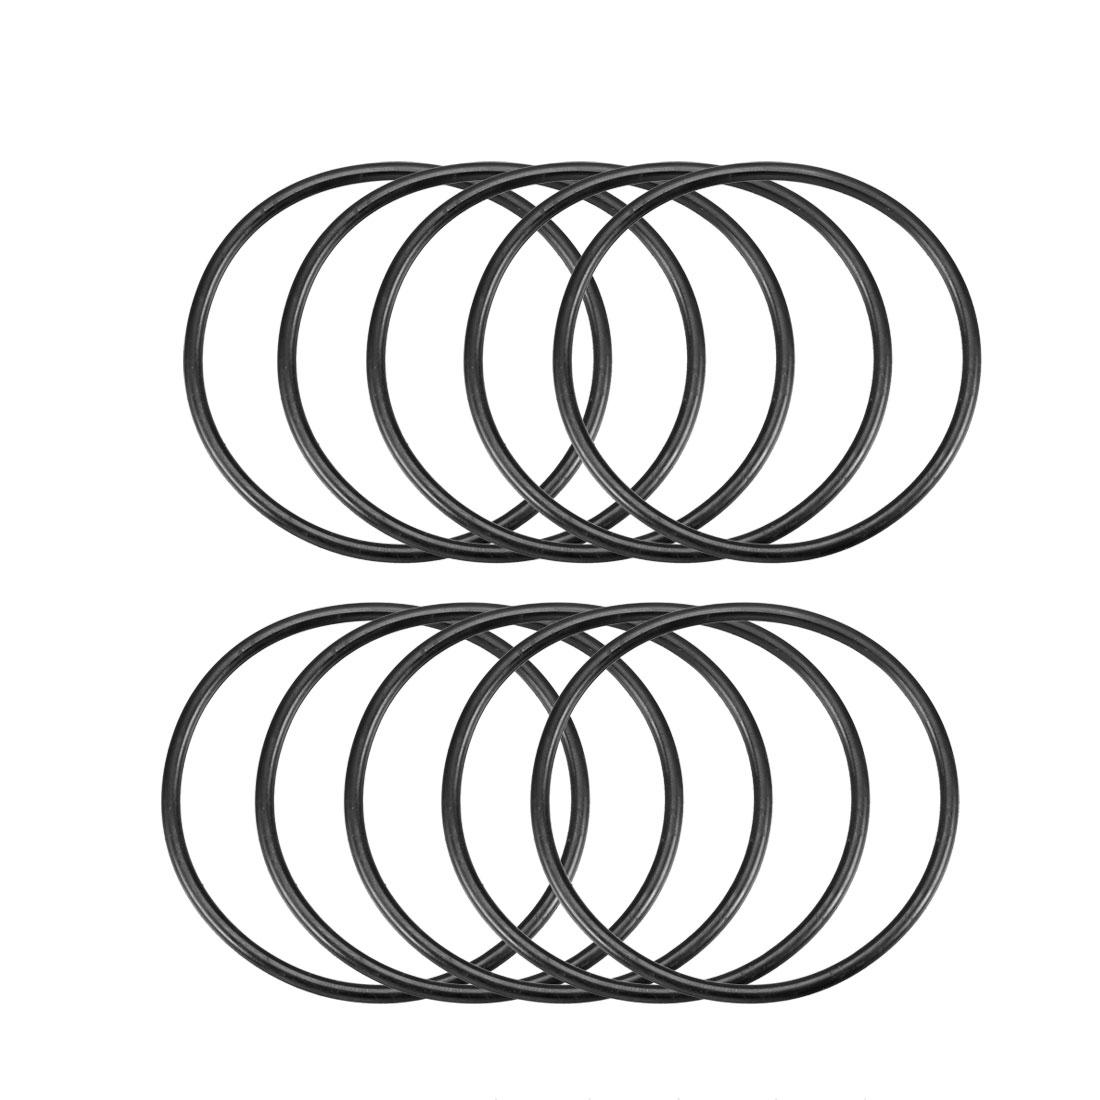 69mm x 3.1mm Flexible Rubber O Ring Sealing Washer Black 10 Pcs